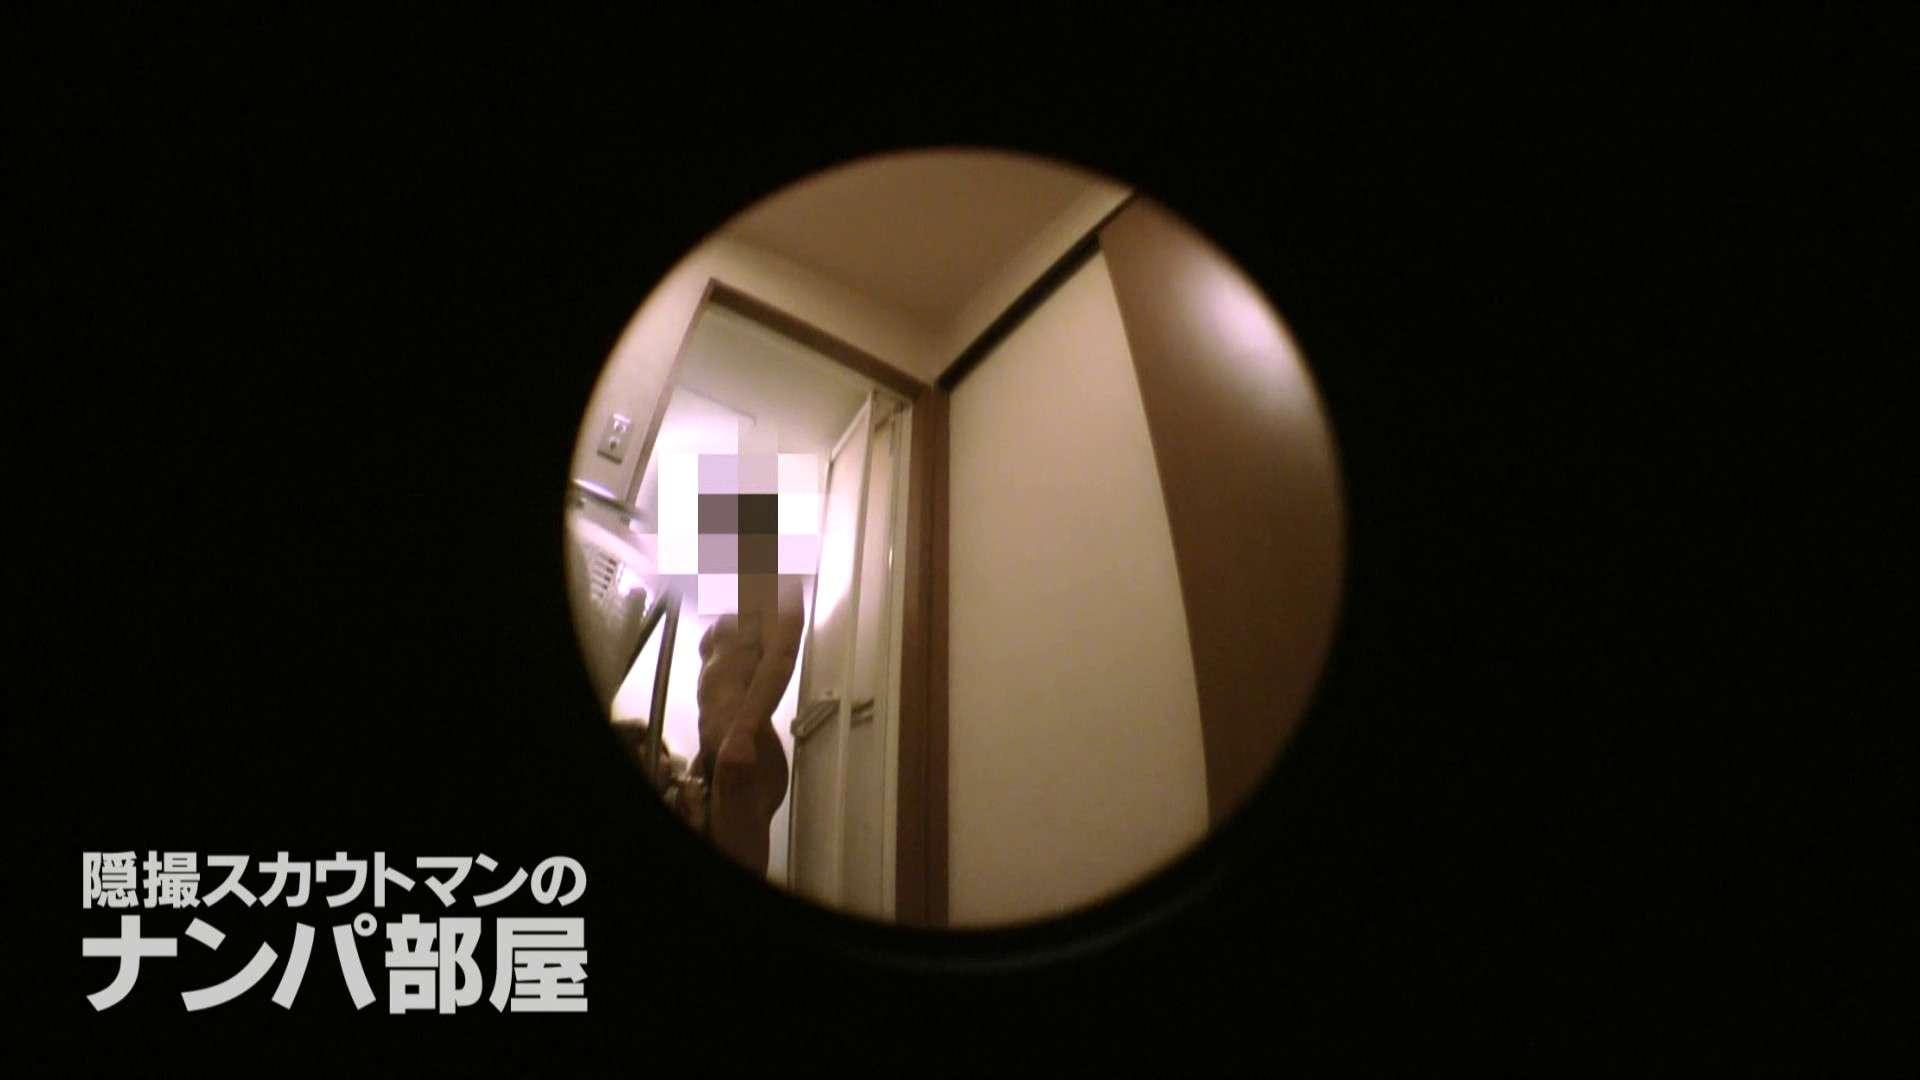 sii ナンパ セックス無修正動画無料 49画像 27